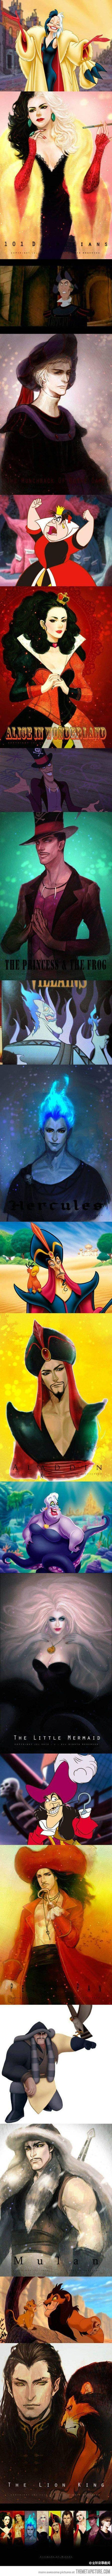 disney antagonists ディズニーの魔法 悪役 ディズニーの画像